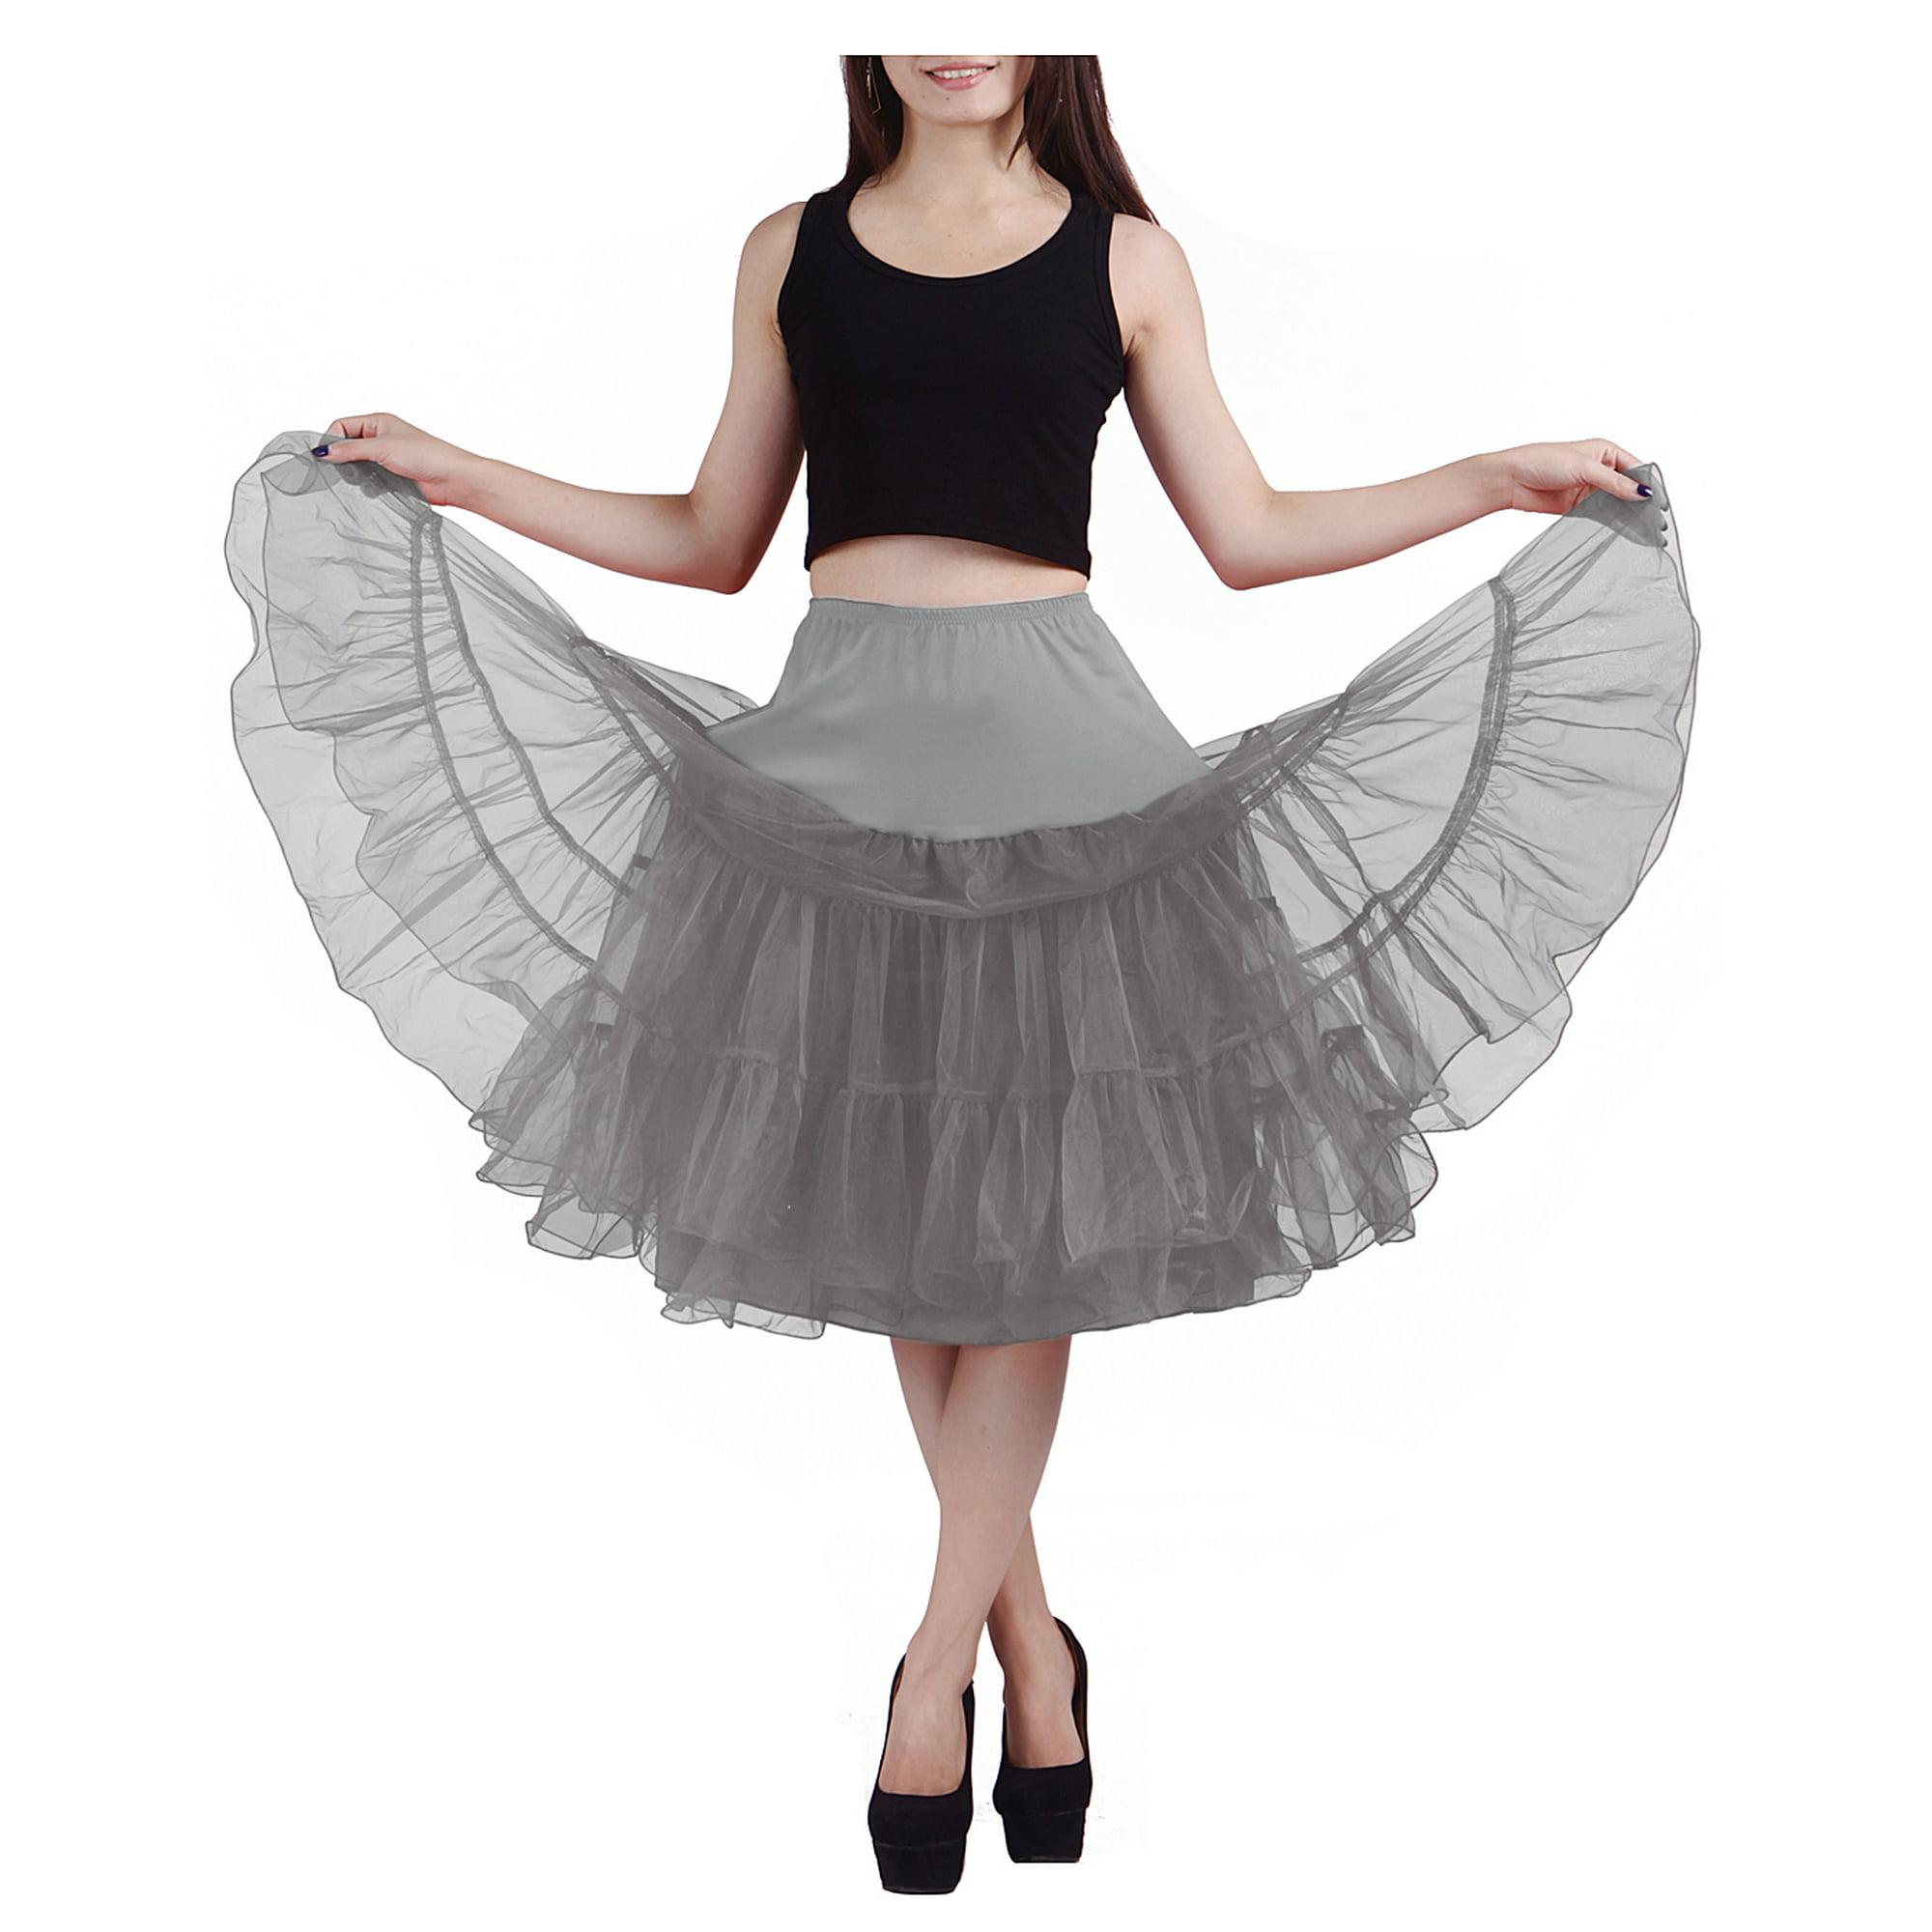 a047684b1e90 HDE Women's Petticoat Vintage Slip Rockabilly Swing Dress Underskirt Tutu  Skirt (Small, Yellow) | Walmart Canada